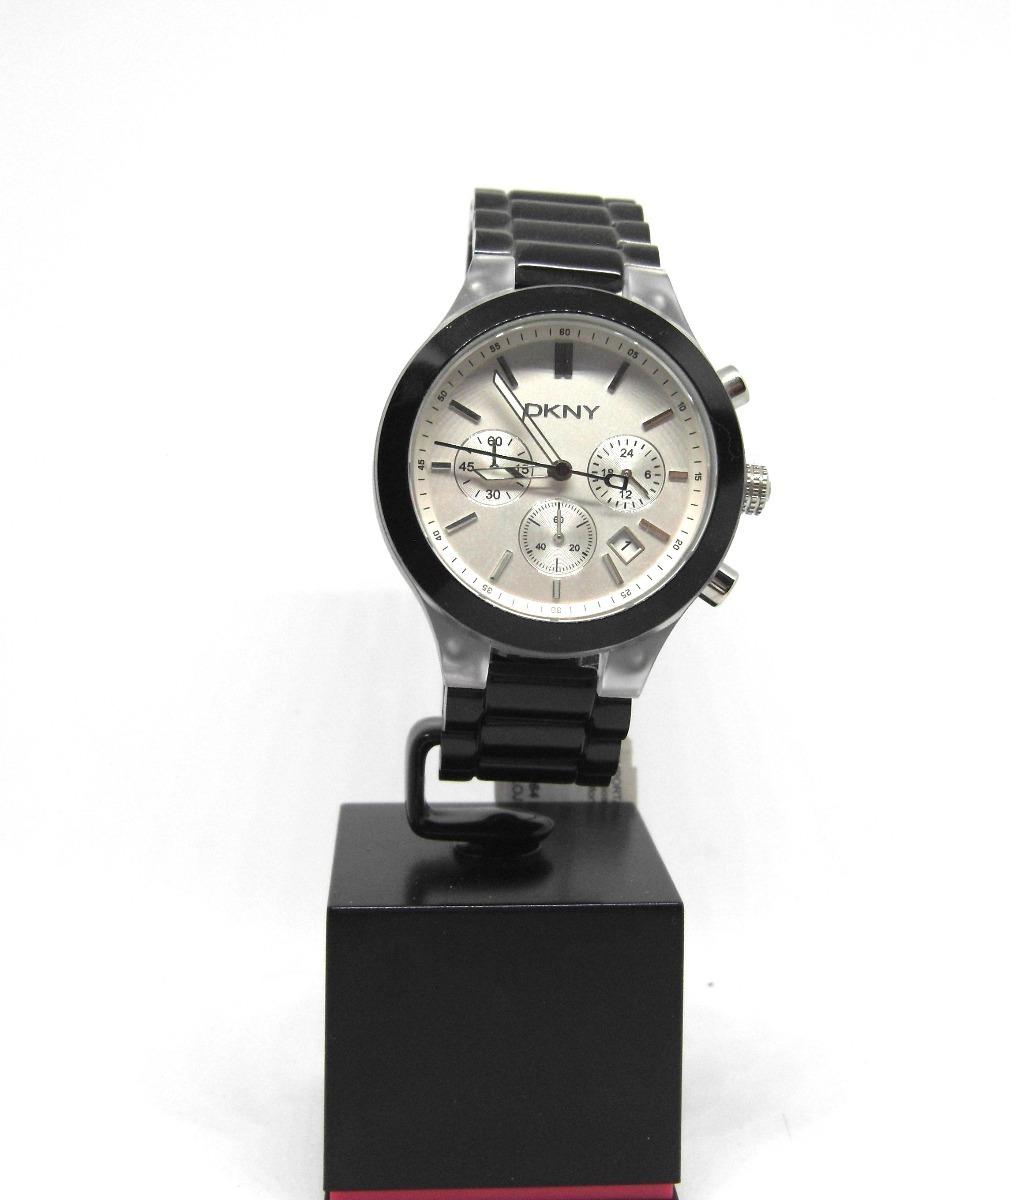 216db4a0d6ab Reloj Dkny Caballero Cronografo